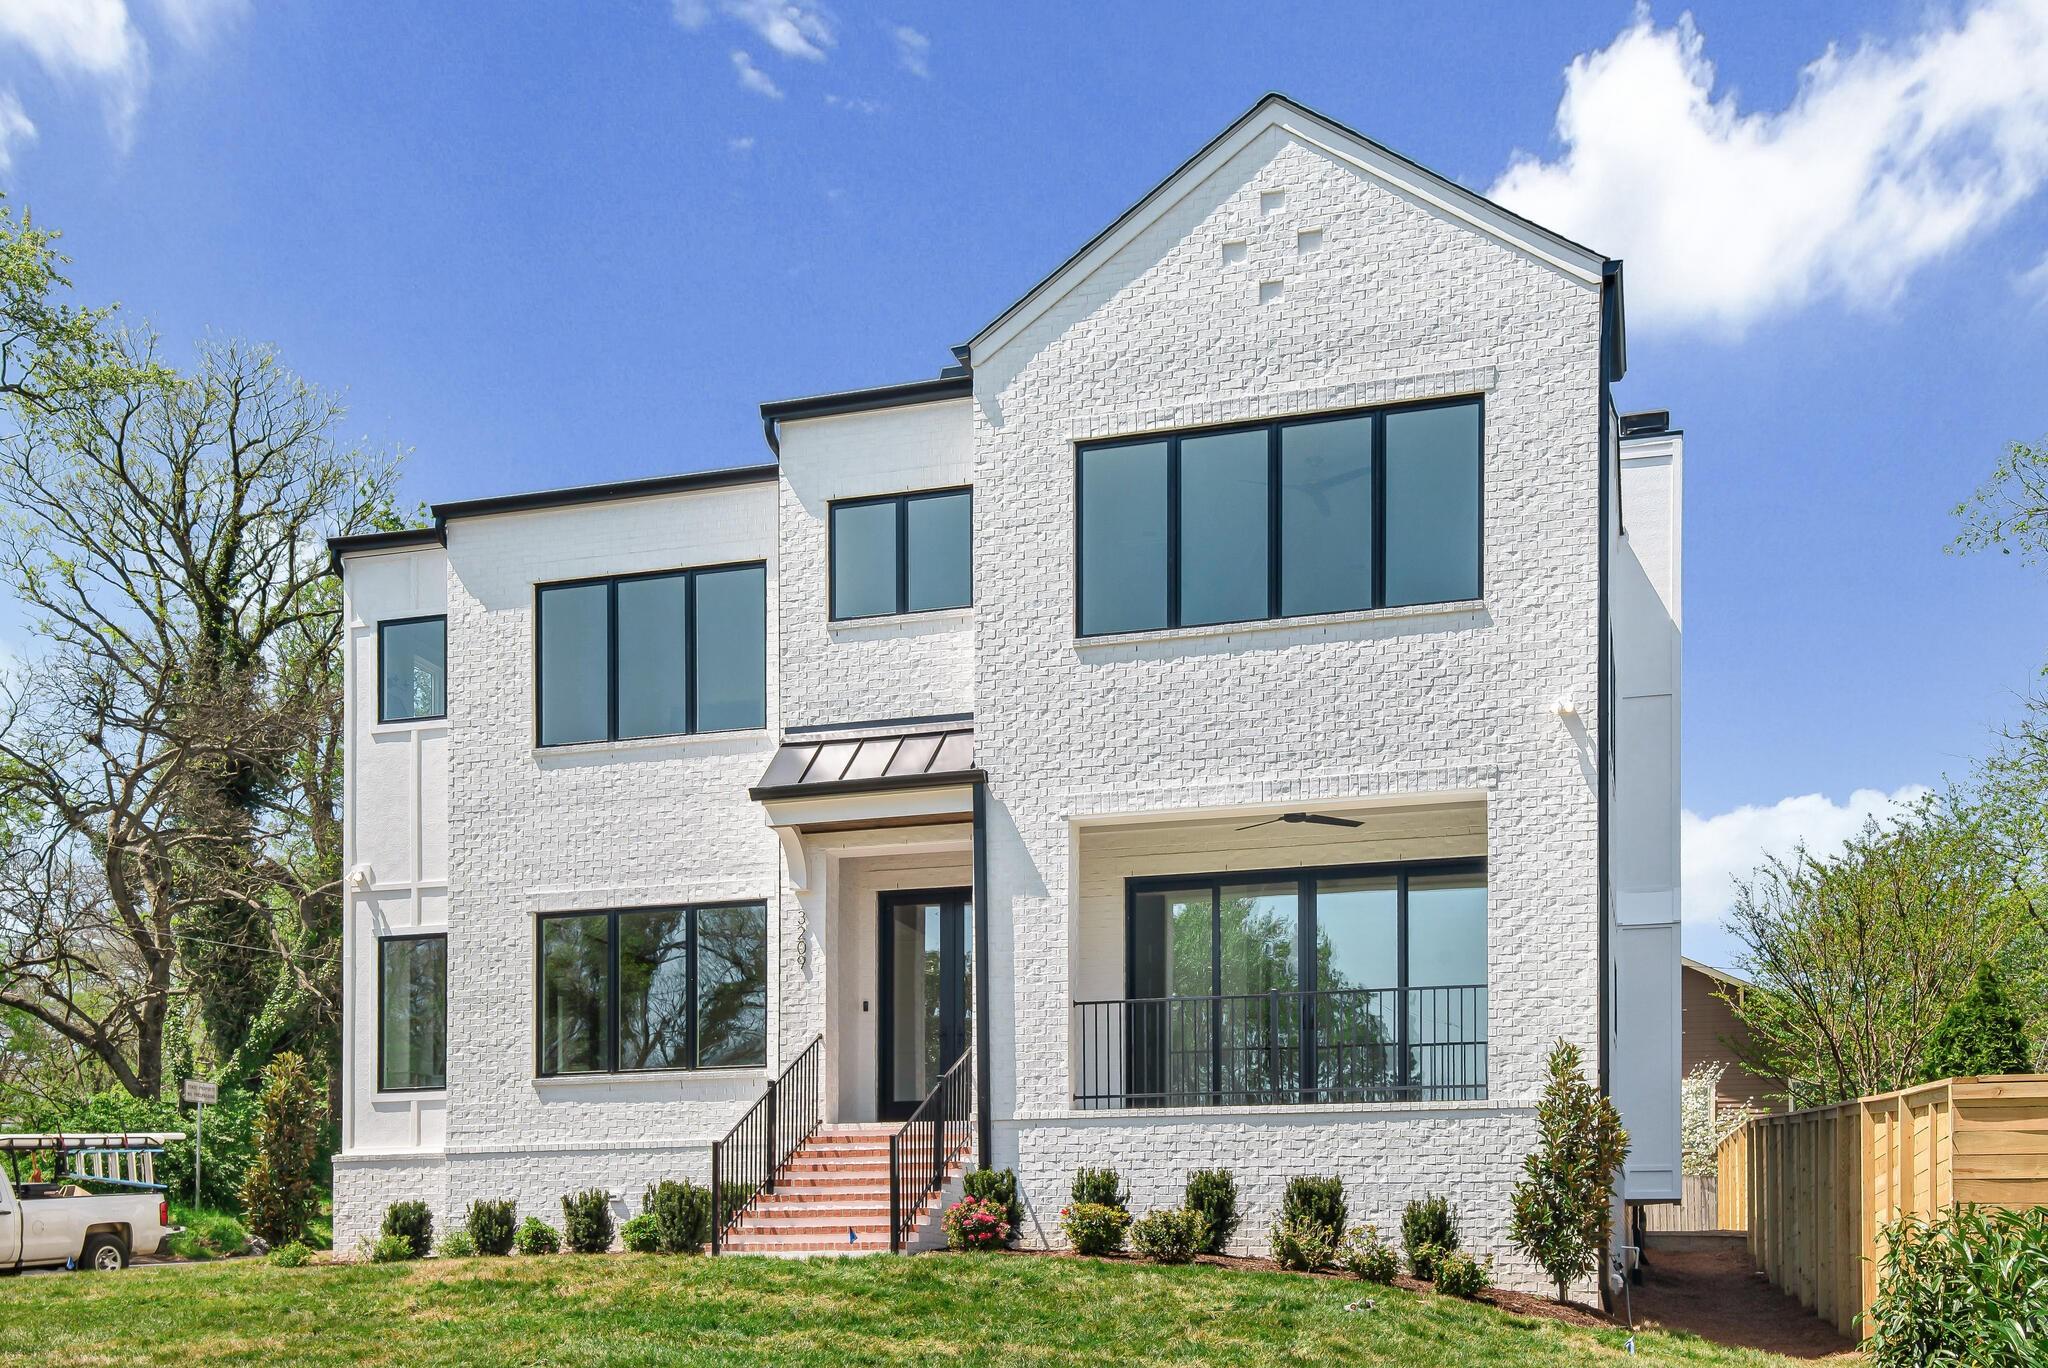 3209 Granny White Pike Property Photo - Nashville, TN real estate listing